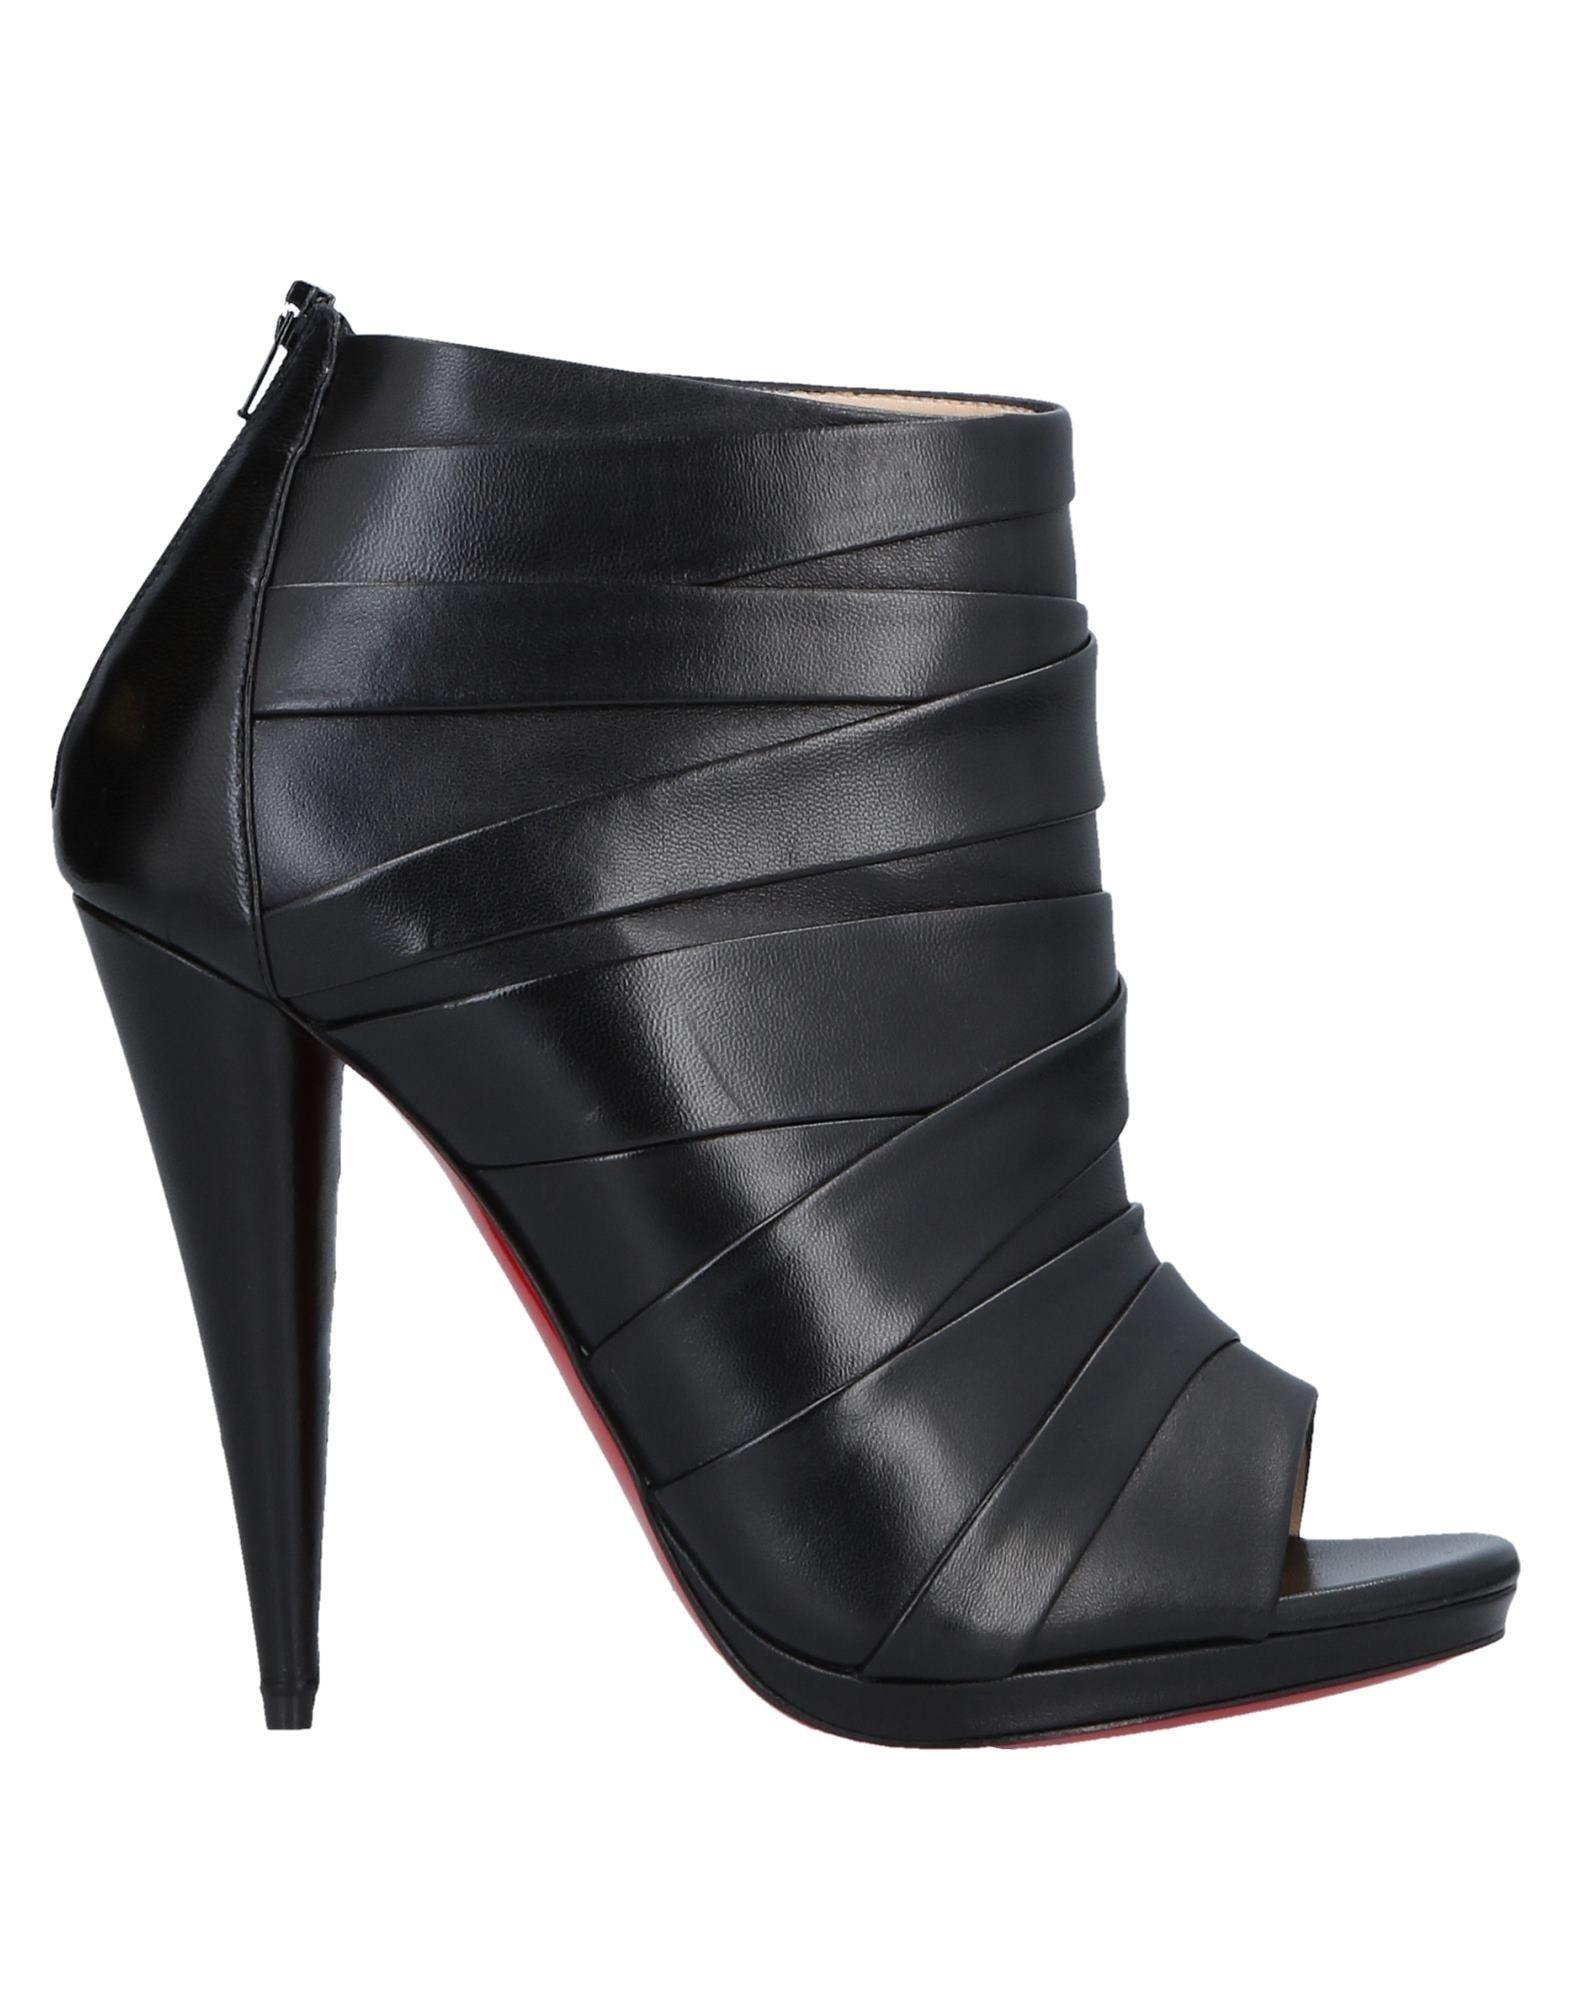 Christian Louboutin gut Stiefelette Damen  11516964LCGünstige gut Louboutin aussehende Schuhe ec2483